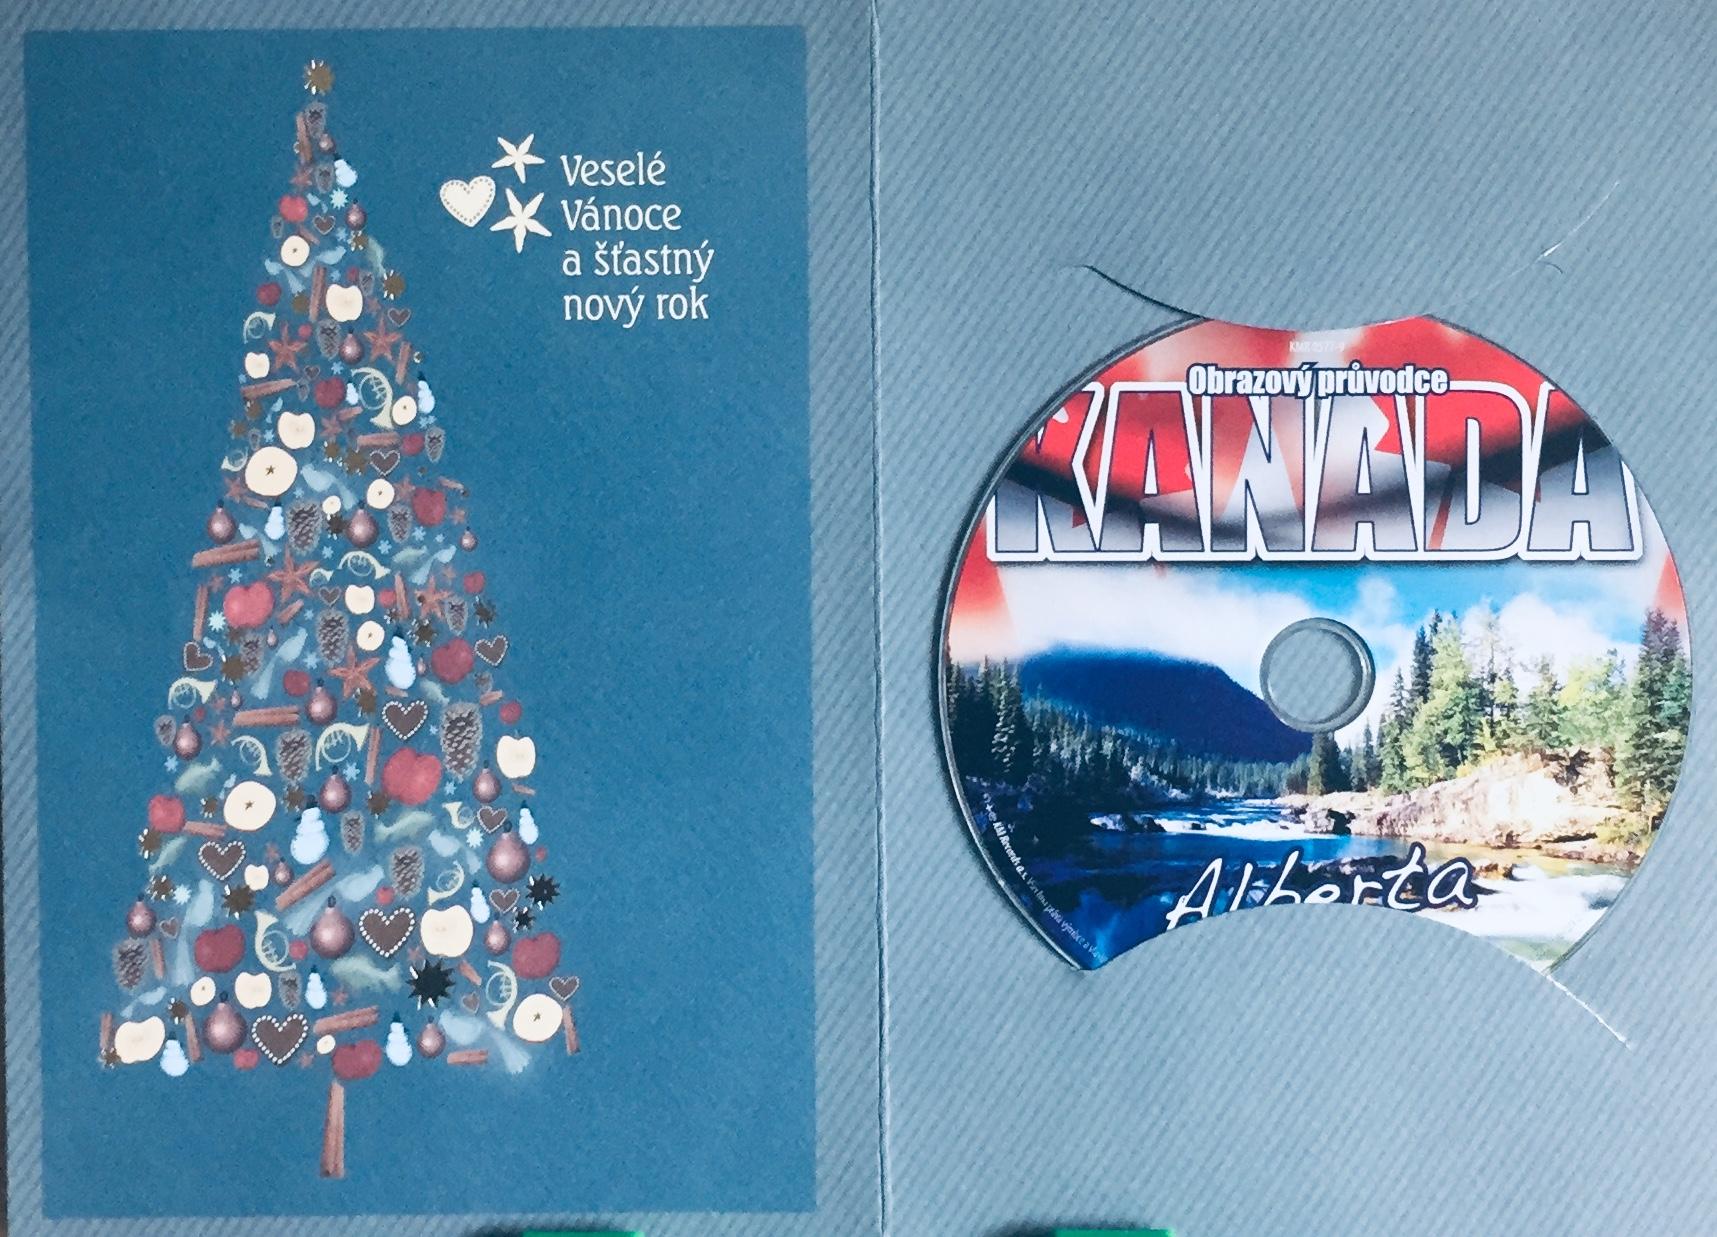 Obrazový průvodce - Kanada - Alberta - DVD /dárkový obal/